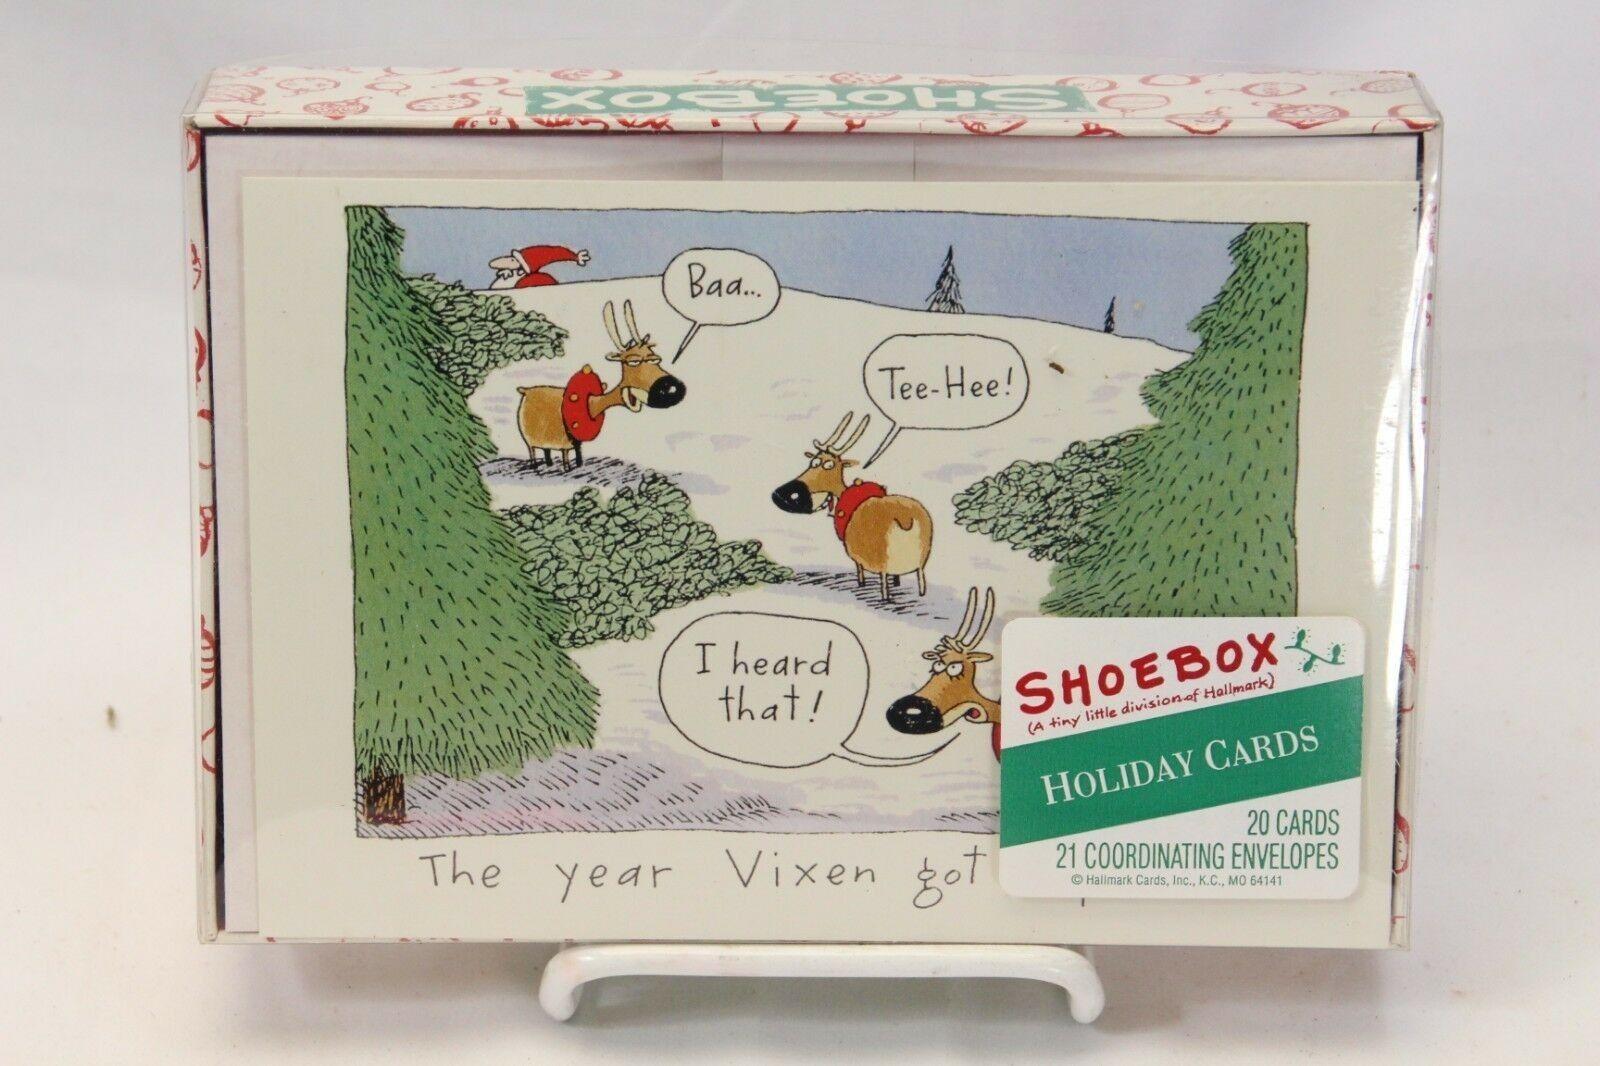 Hallmark chaussuresbox Xmas Cards Vixen got a Perm Lot of 4 with 20 cards each